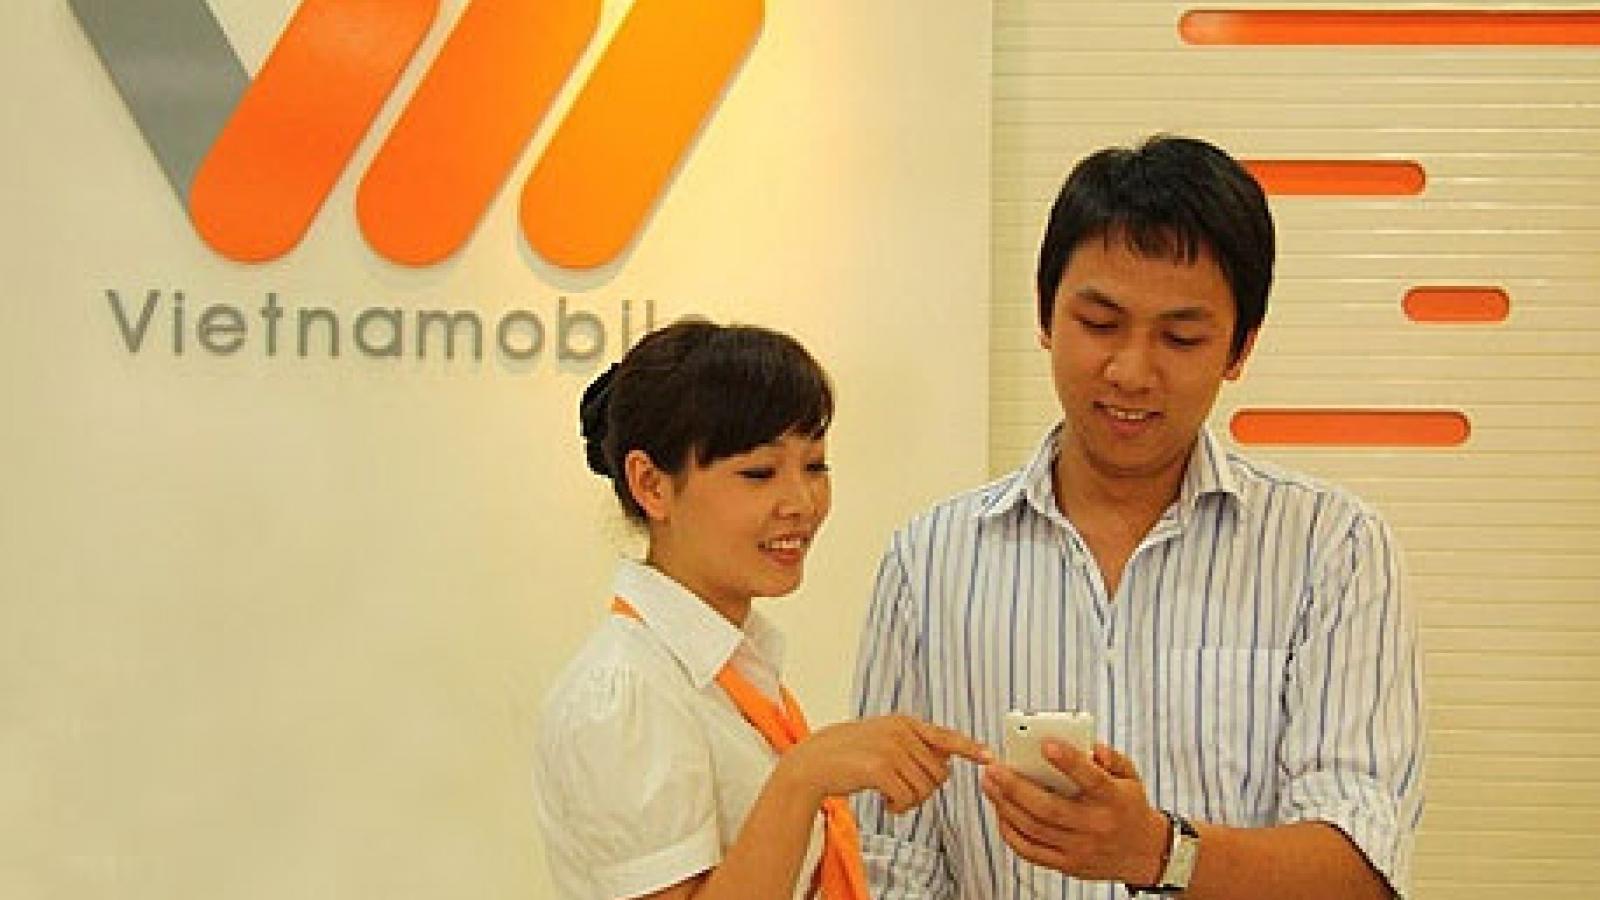 Vietnamobile yet to jump on 4G bandwagon